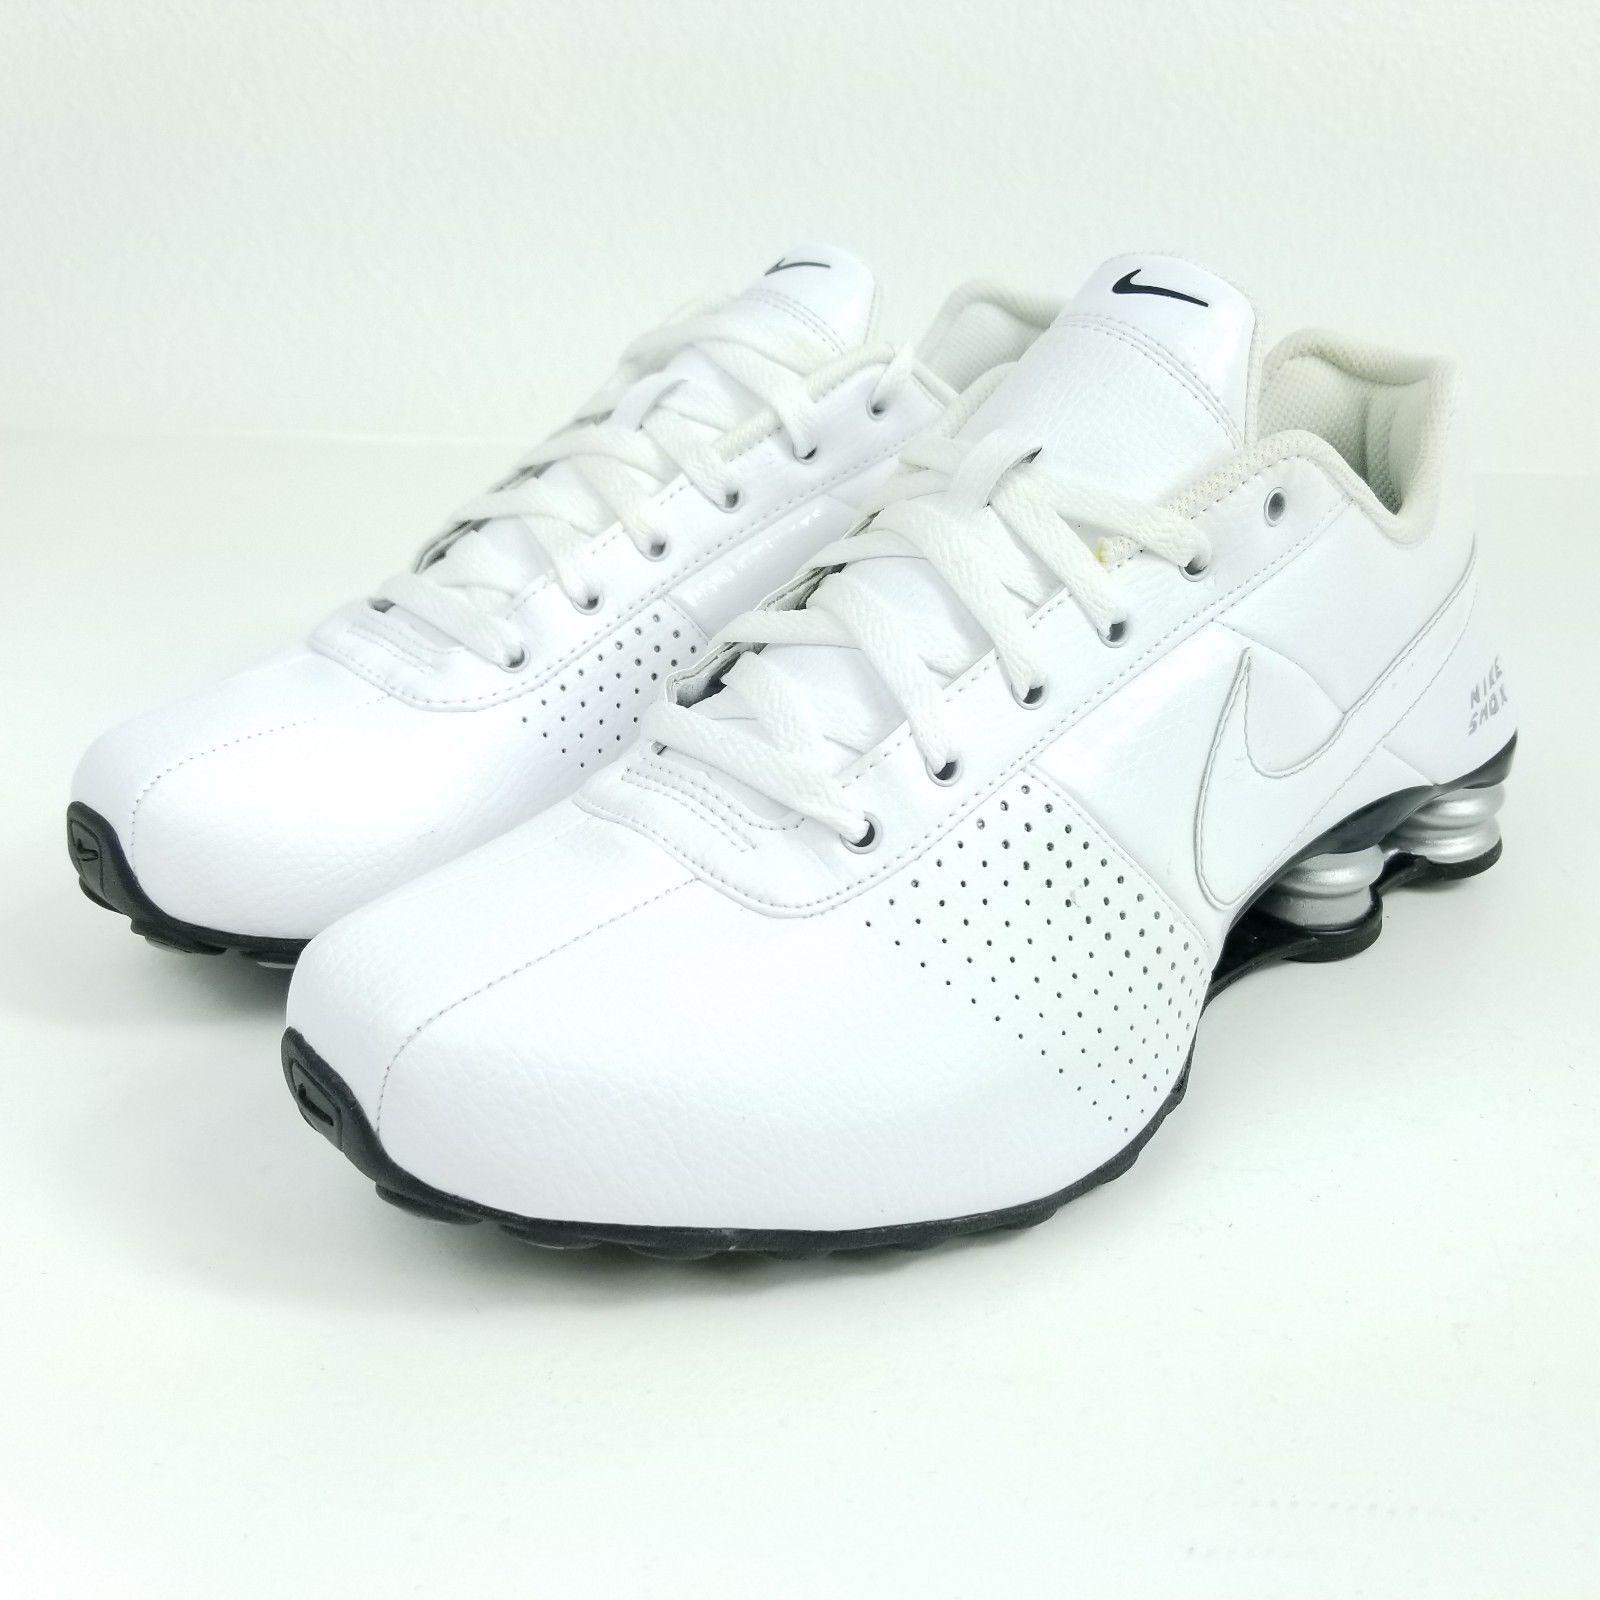 Mens Nike Shox Deliver Premium Sneakers 317547-109 New, All White Silver 317547-109 Sneakers sku AA f9da28